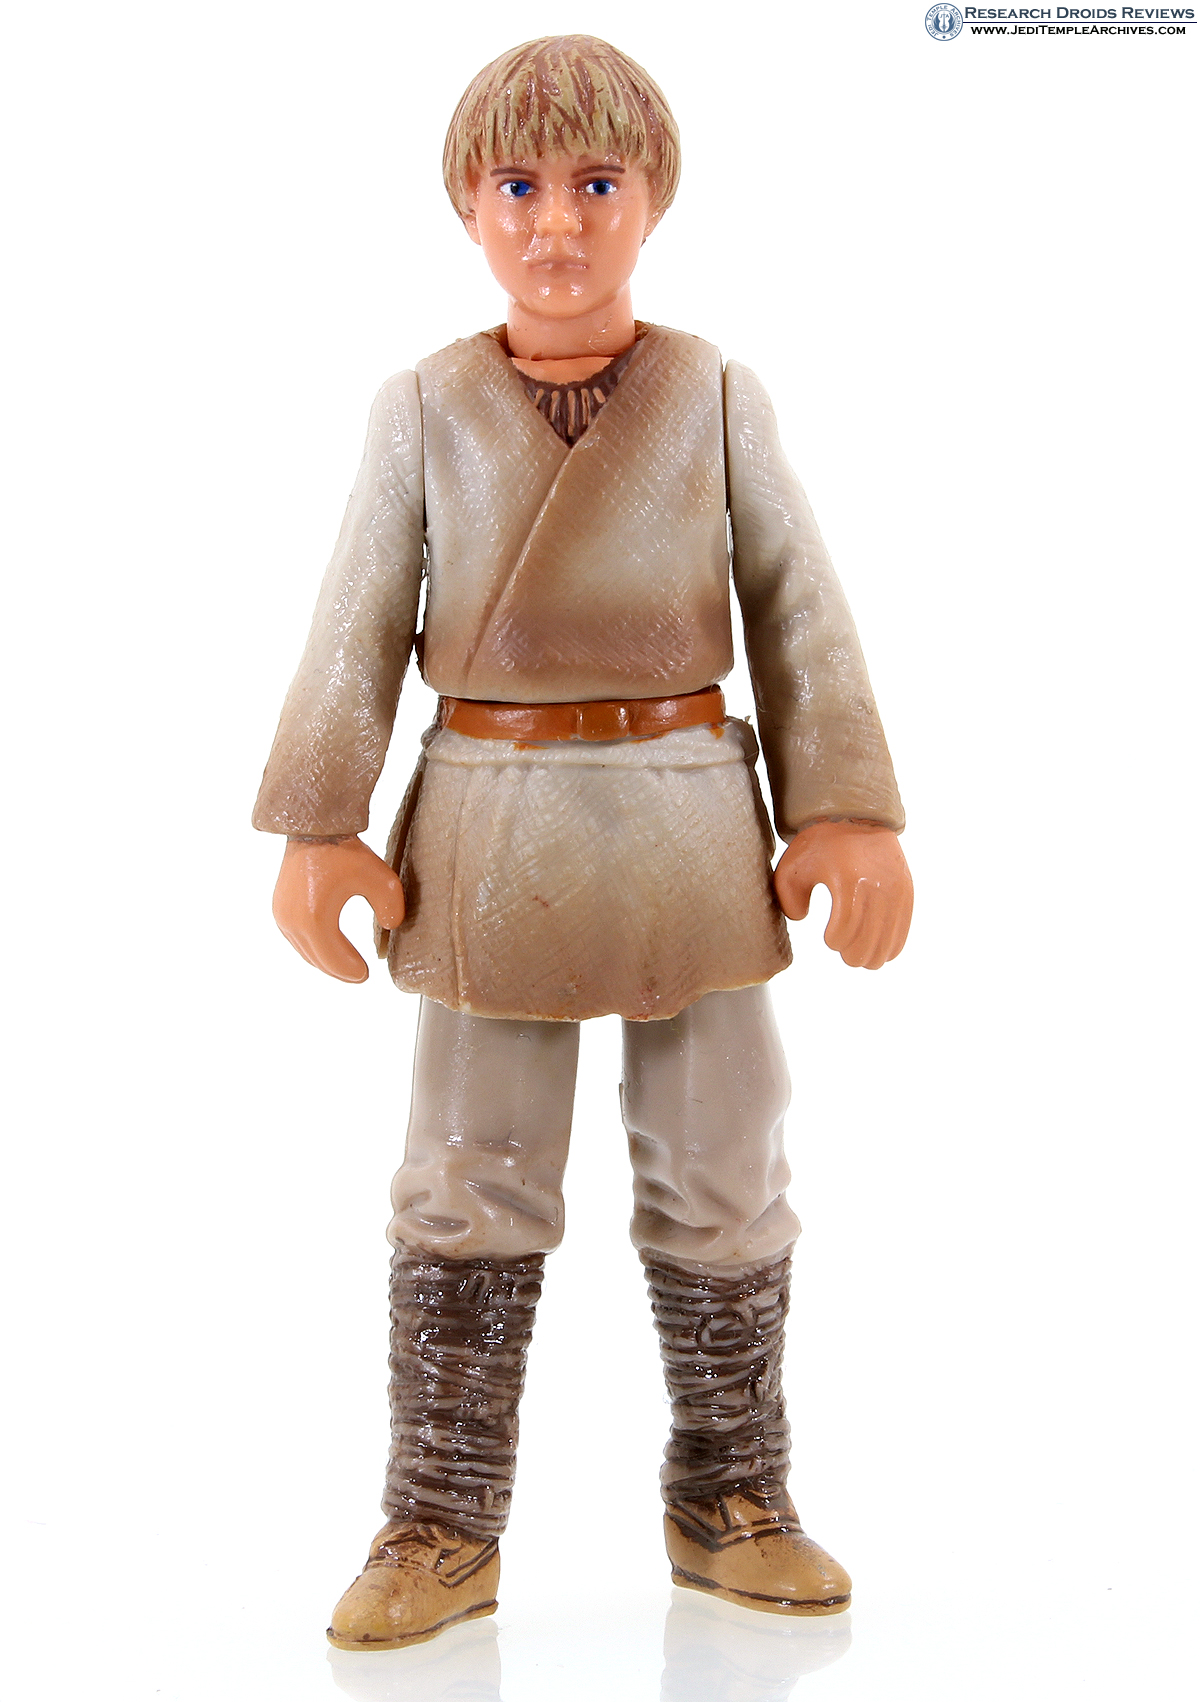 Anakin Skywalker (Tatooine)